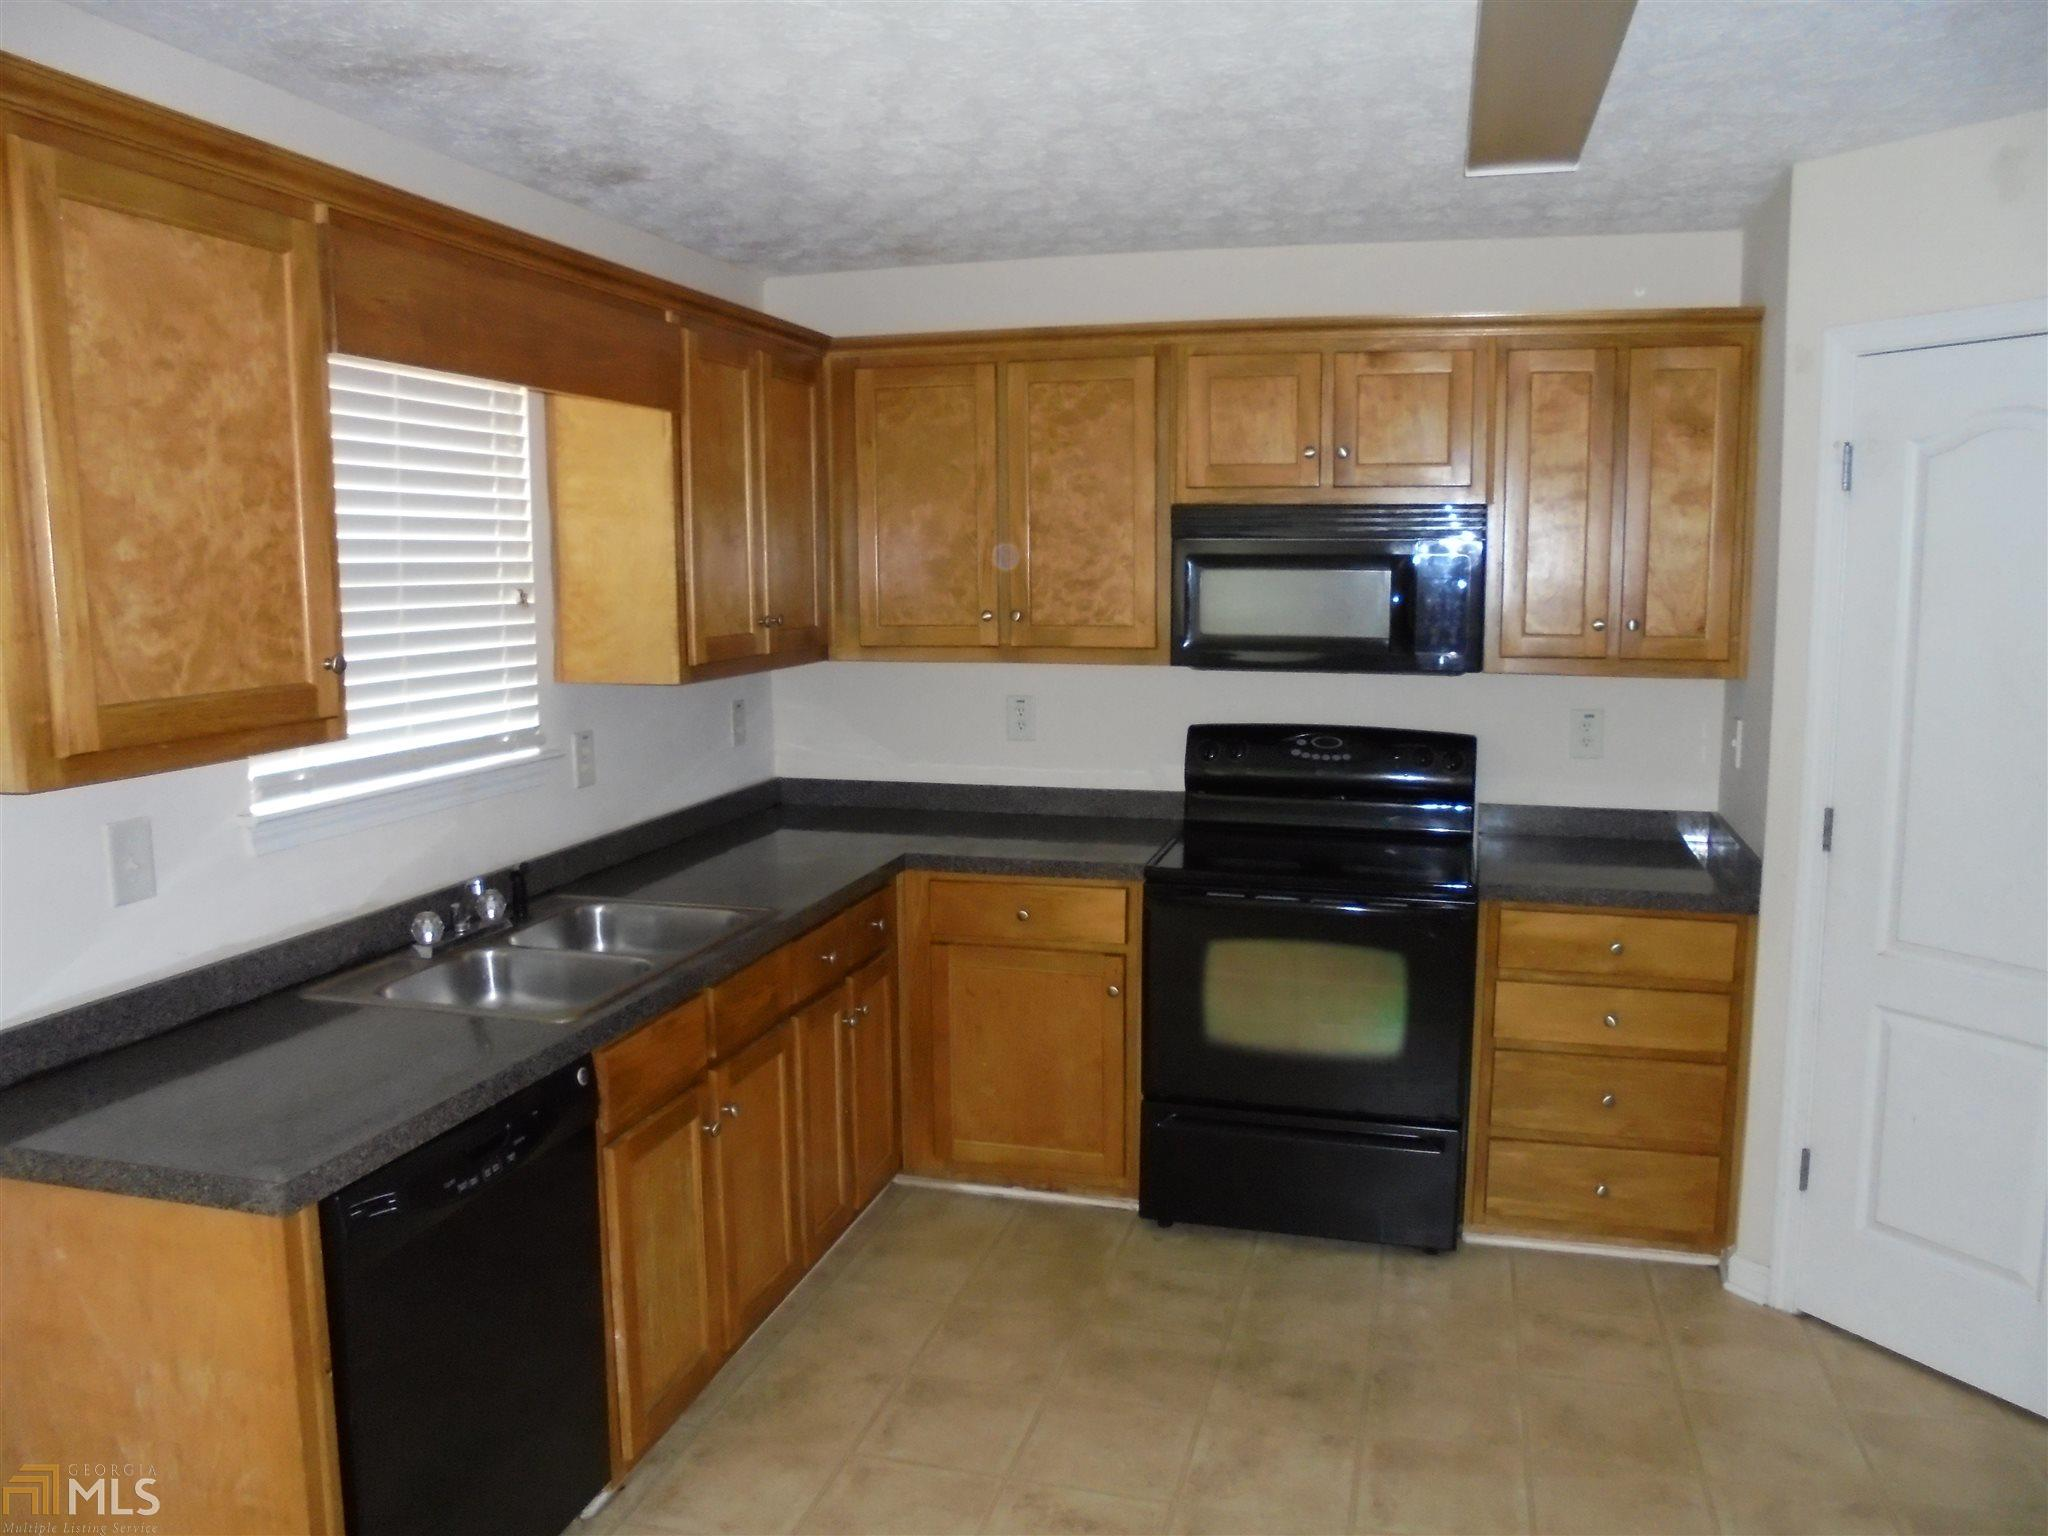 521 Howell Drive, Locust Grove, GA 30248